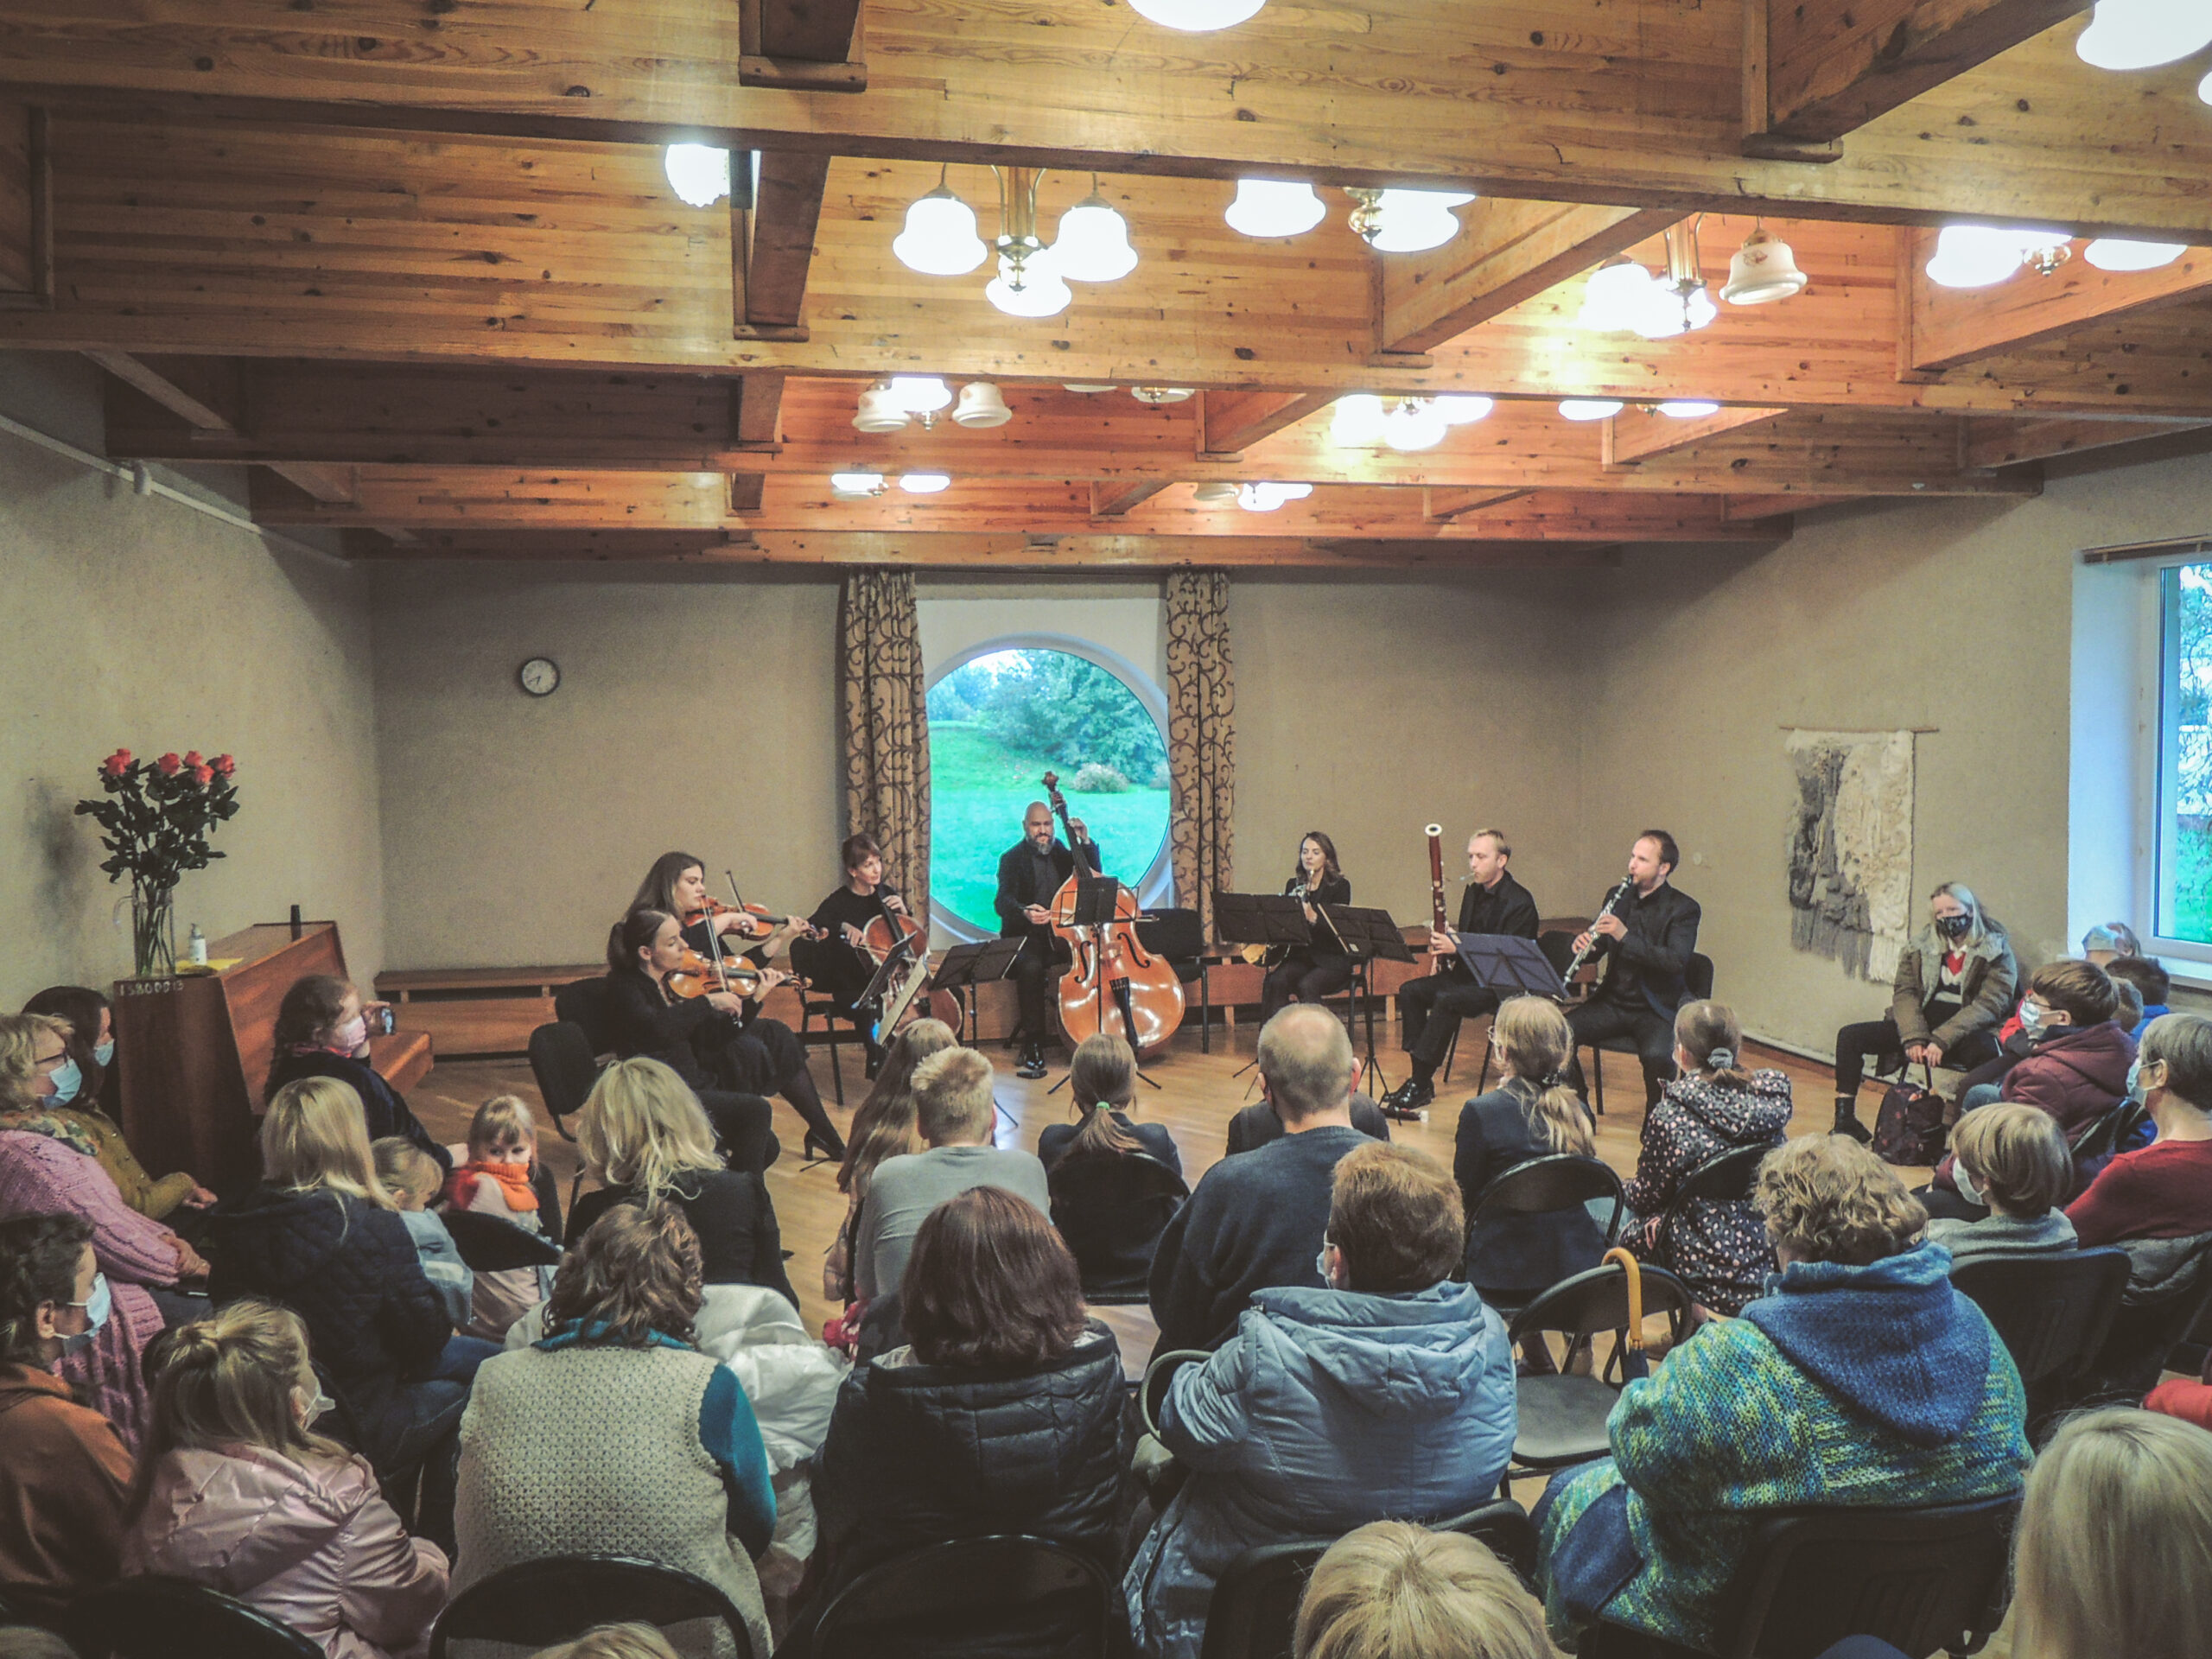 Šį vakar Rumšiškių kultūros centre skambėjo Ludwig Van Beethovenu – Septetas Es-dur, op. 20